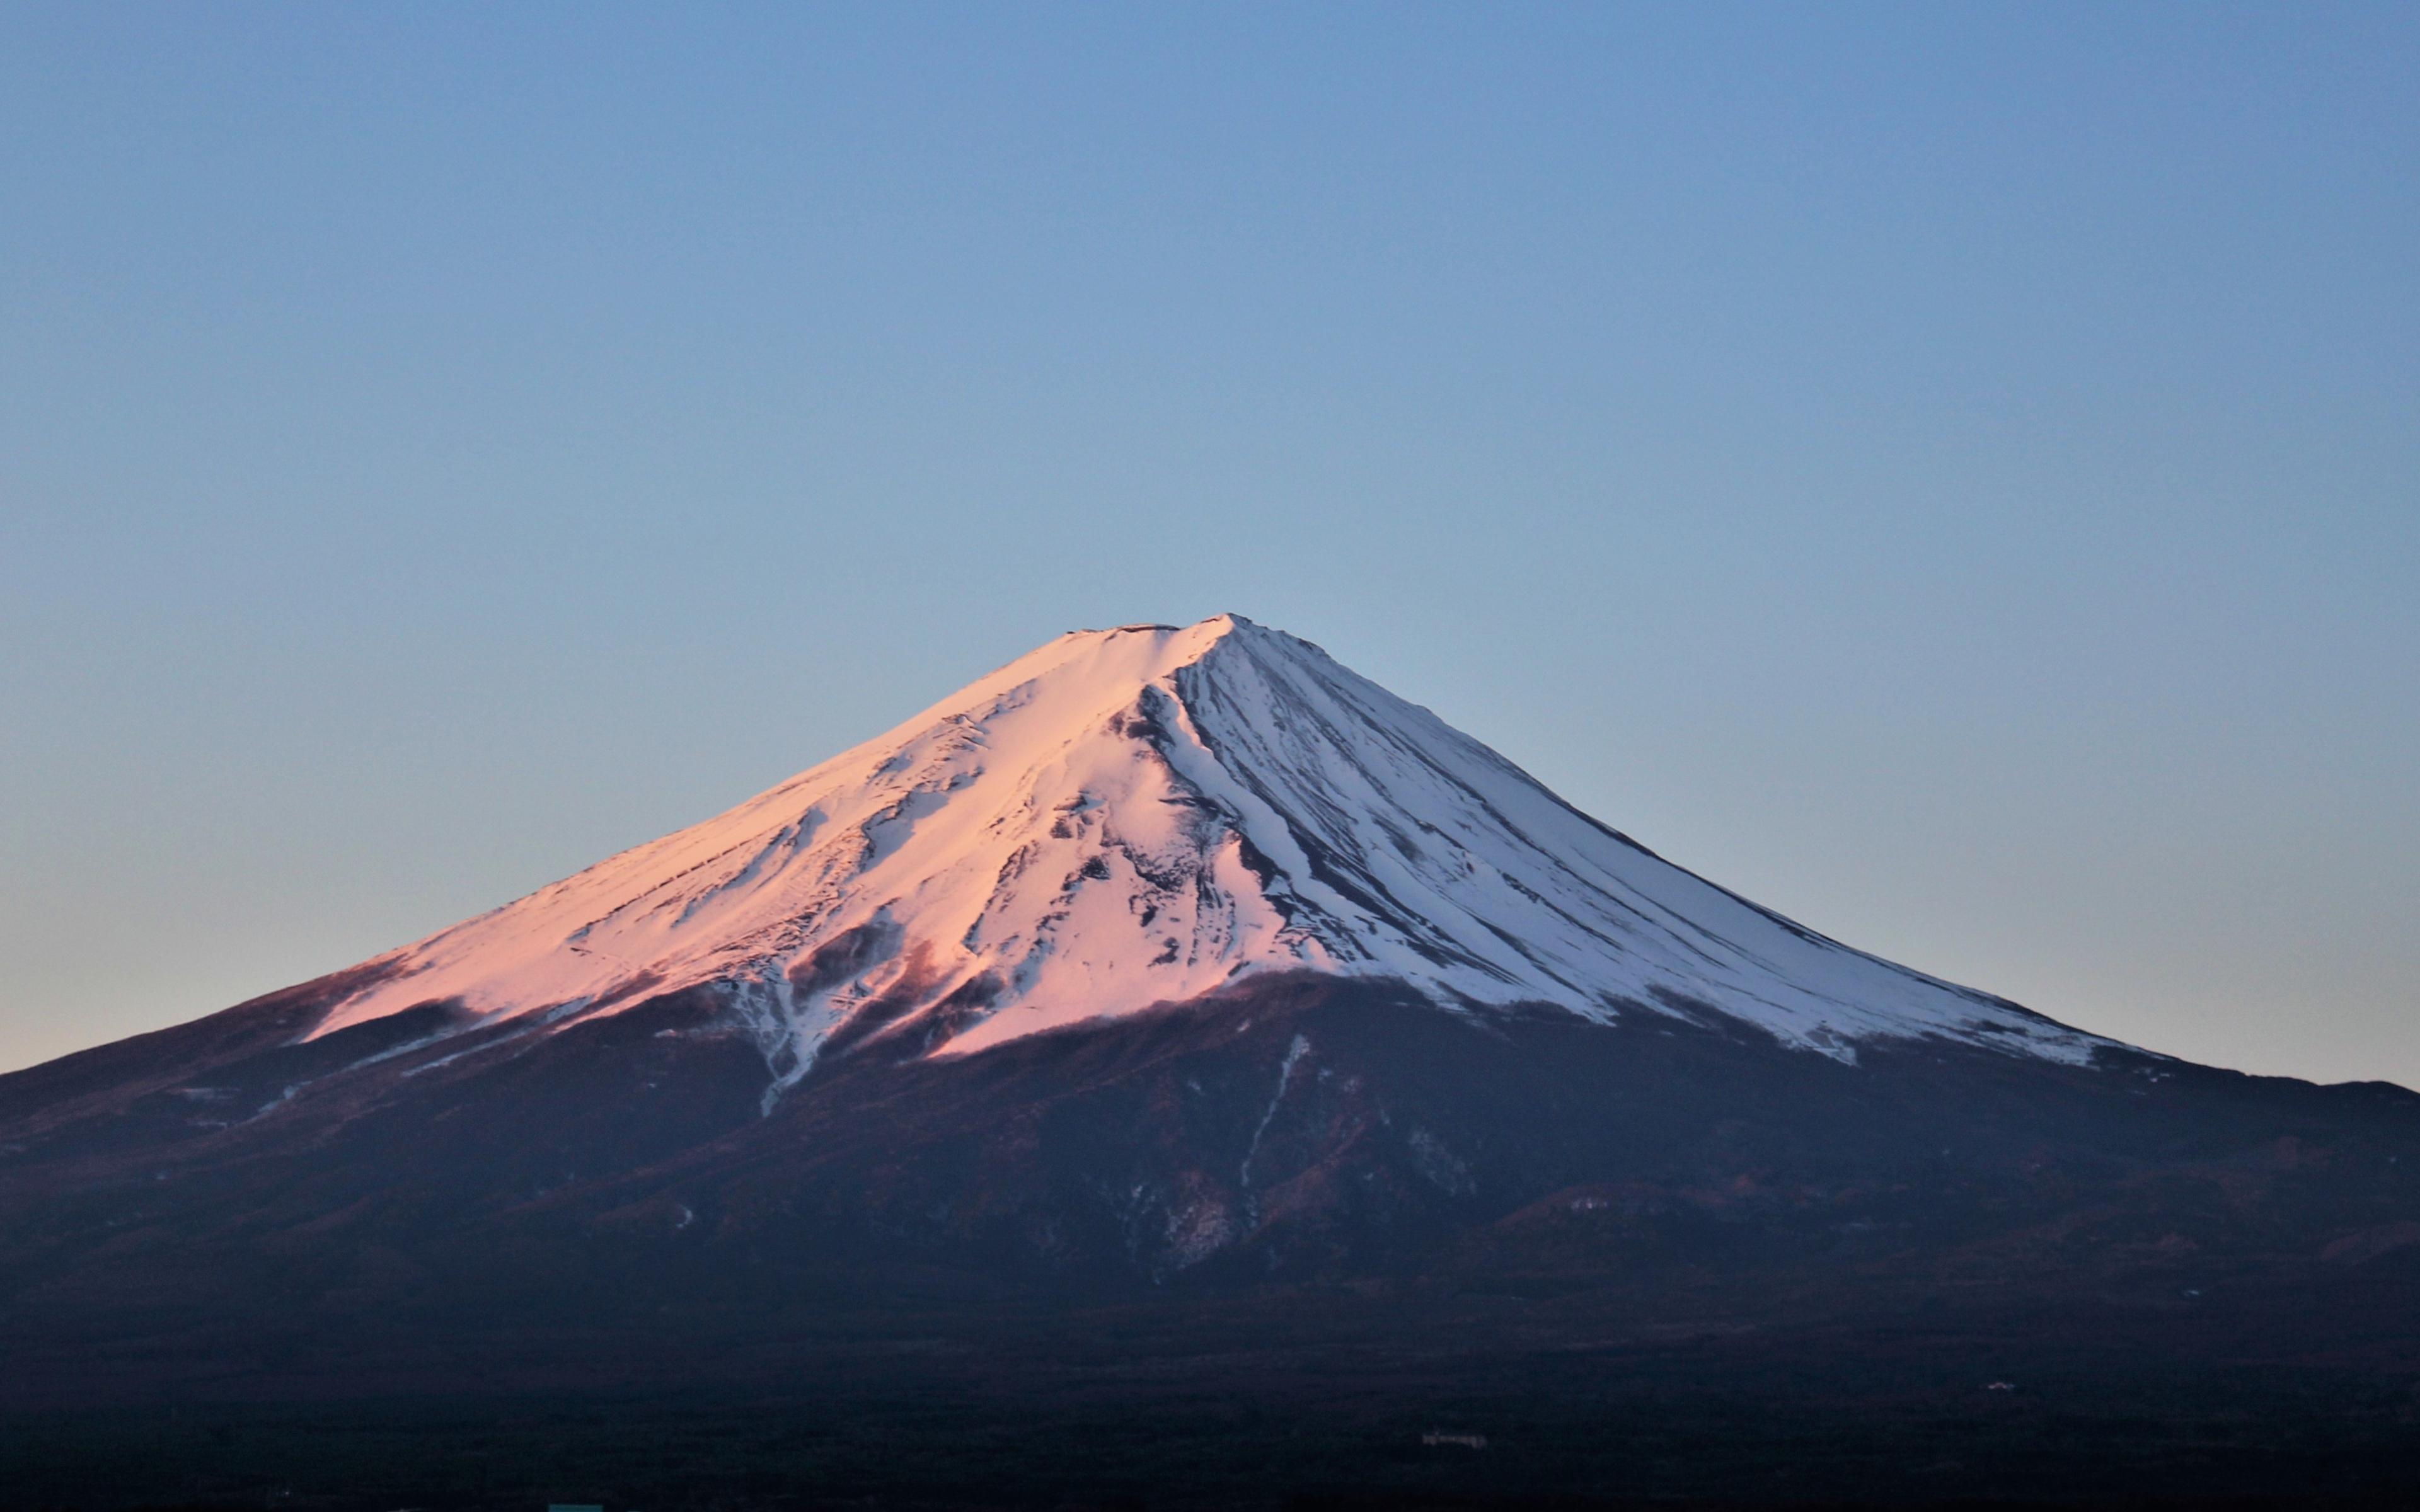 Download 3840x2400 Wallpaper Mount Fuji Peak Sky Mountain